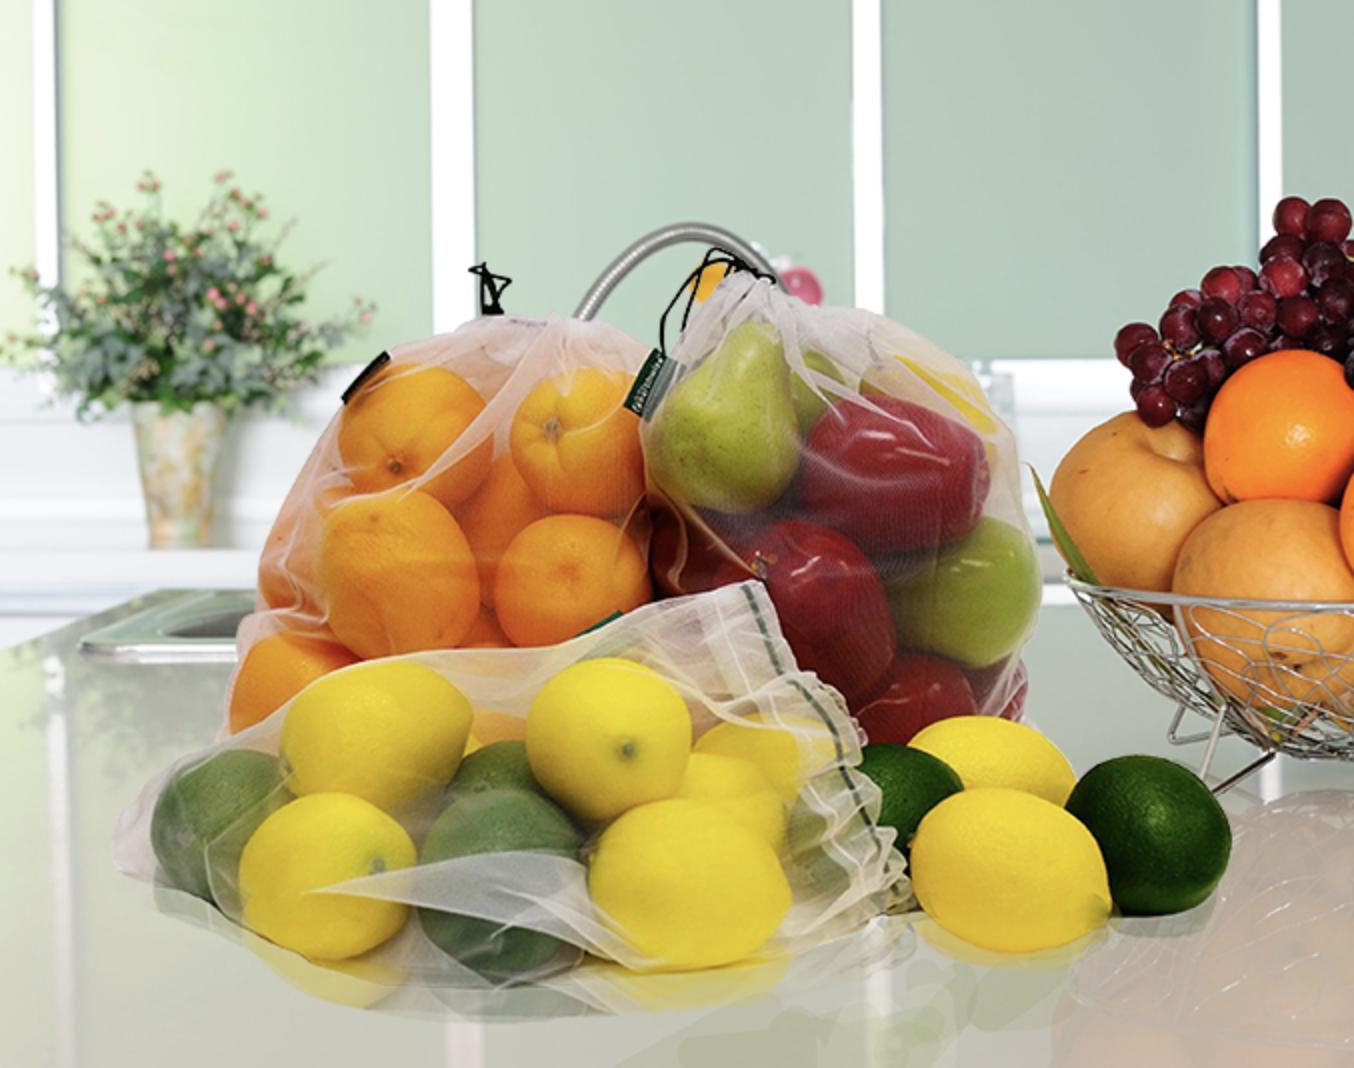 Three mesh bags full of fresh fruit